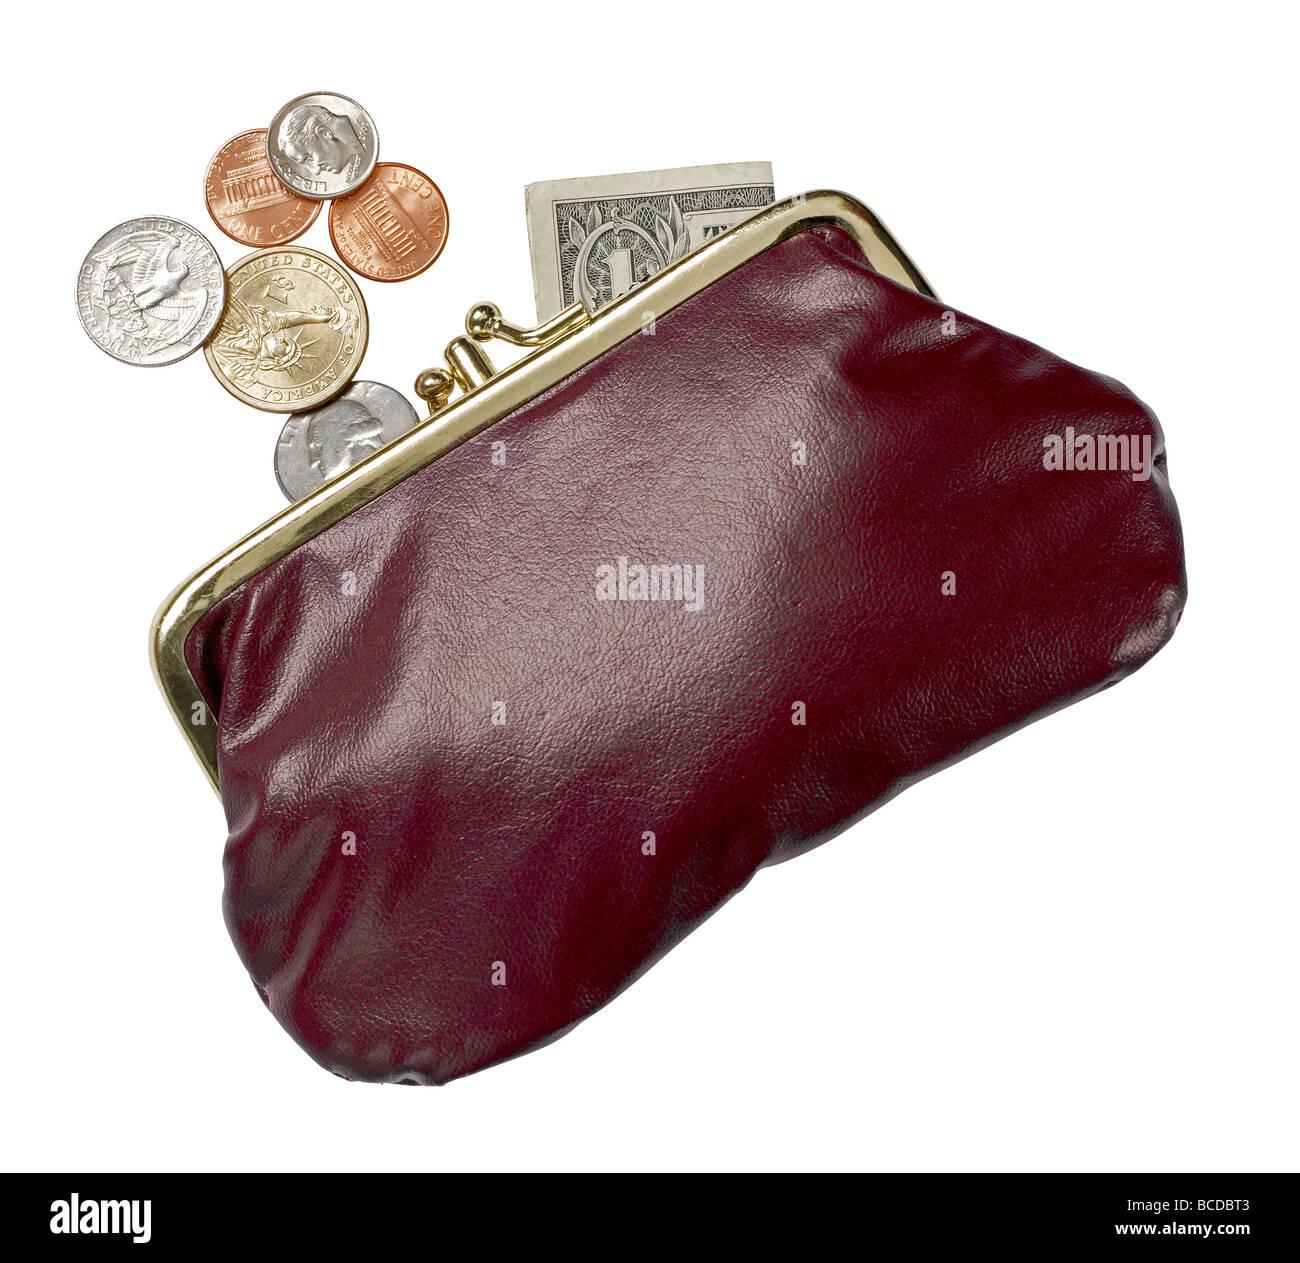 Sac à main en cuir bourgogne ouvert argent dollar pièces elevated view Photo Stock